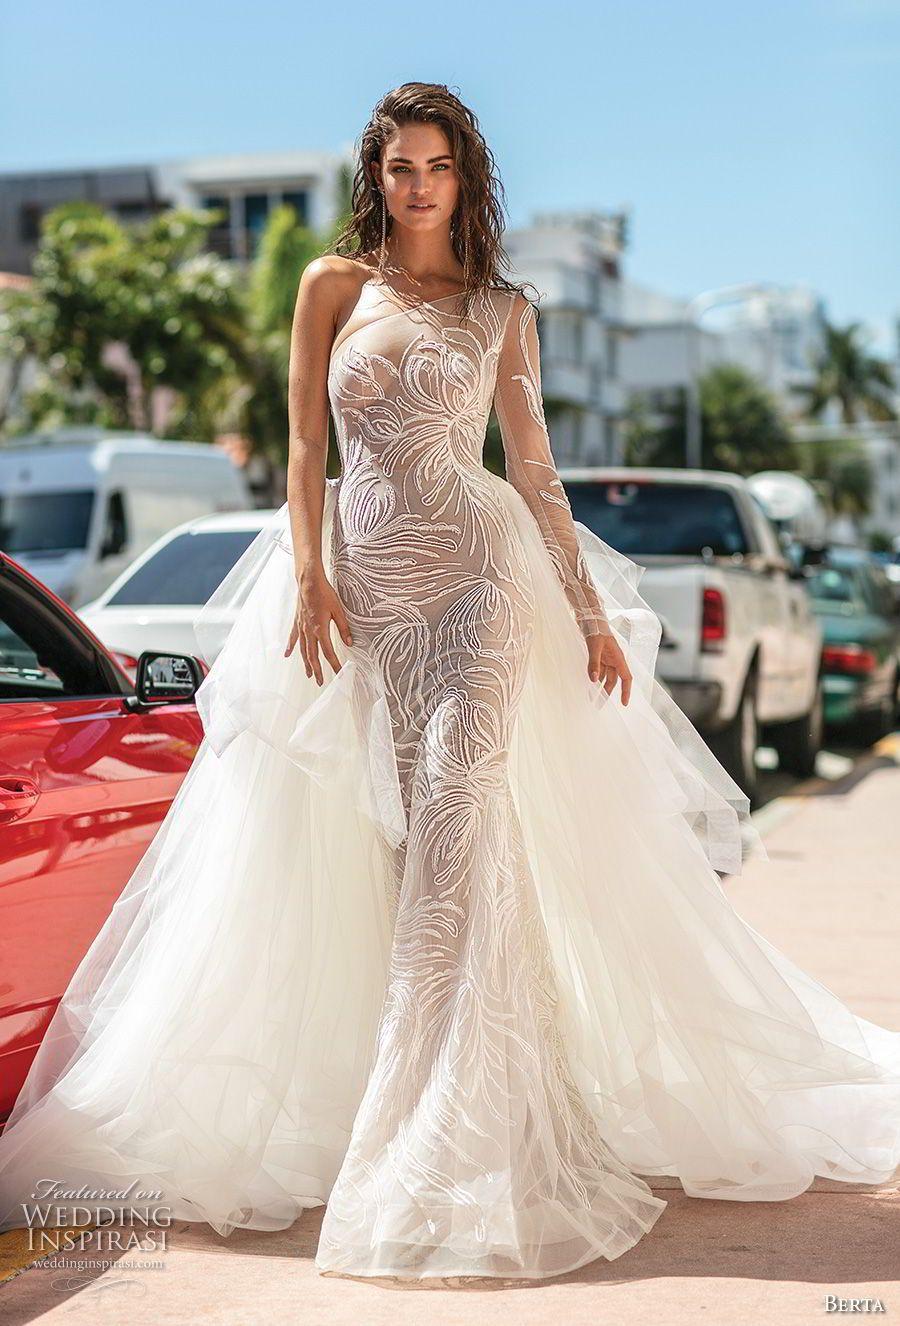 Berta Spring 2019 Bridal Long Sleeves One Shoulder Neckline Full Embellishment Tiered Skirt Glamorous Fit And Flare Wedding Dress A Line Overskirt